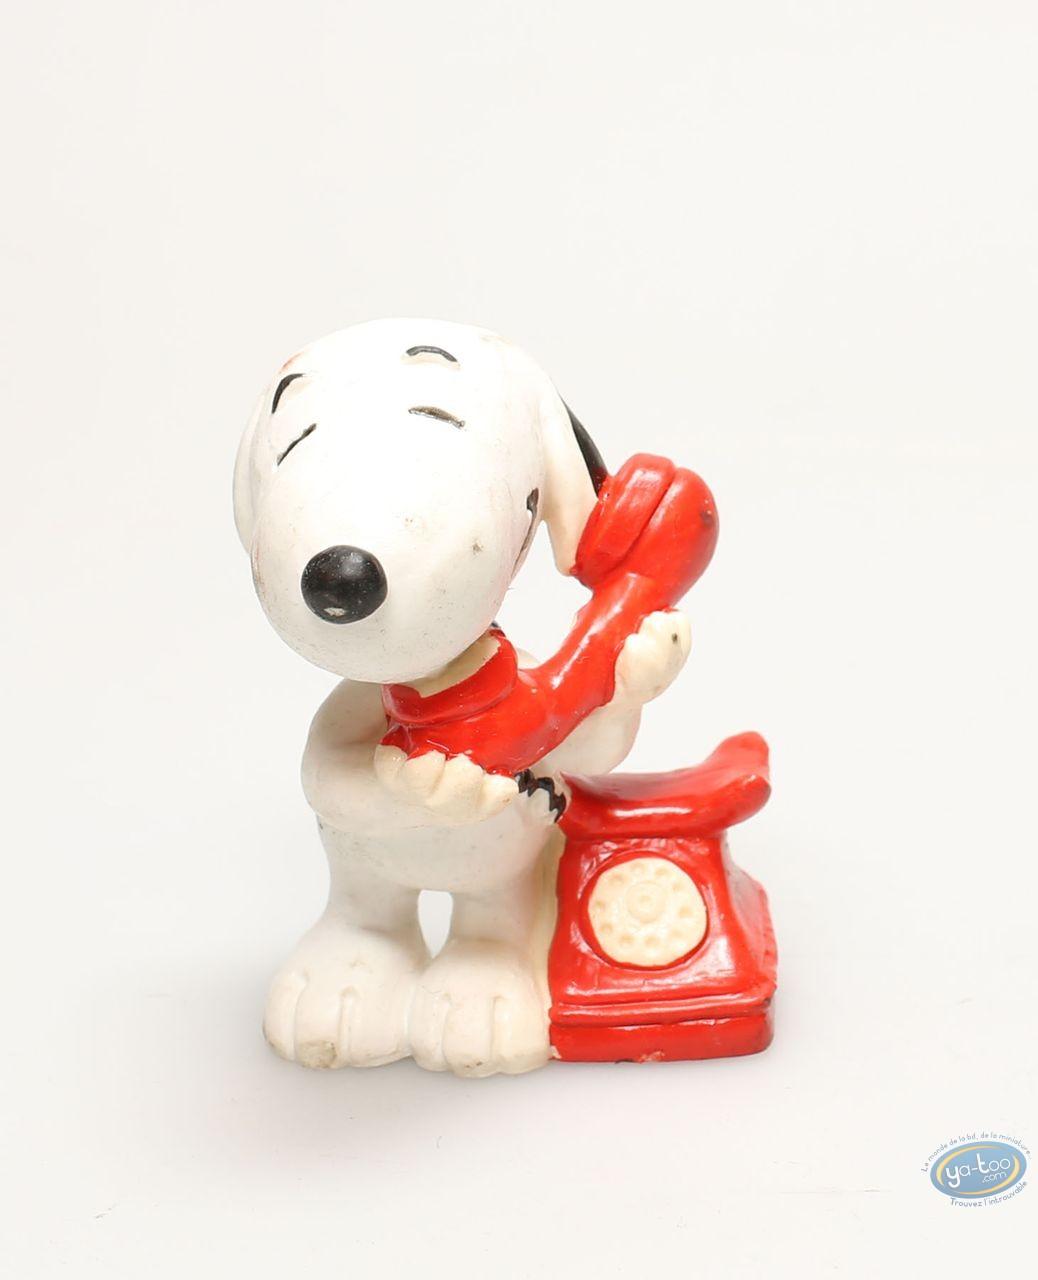 Plastic Figurine, Snoopy : Snoopy at phone